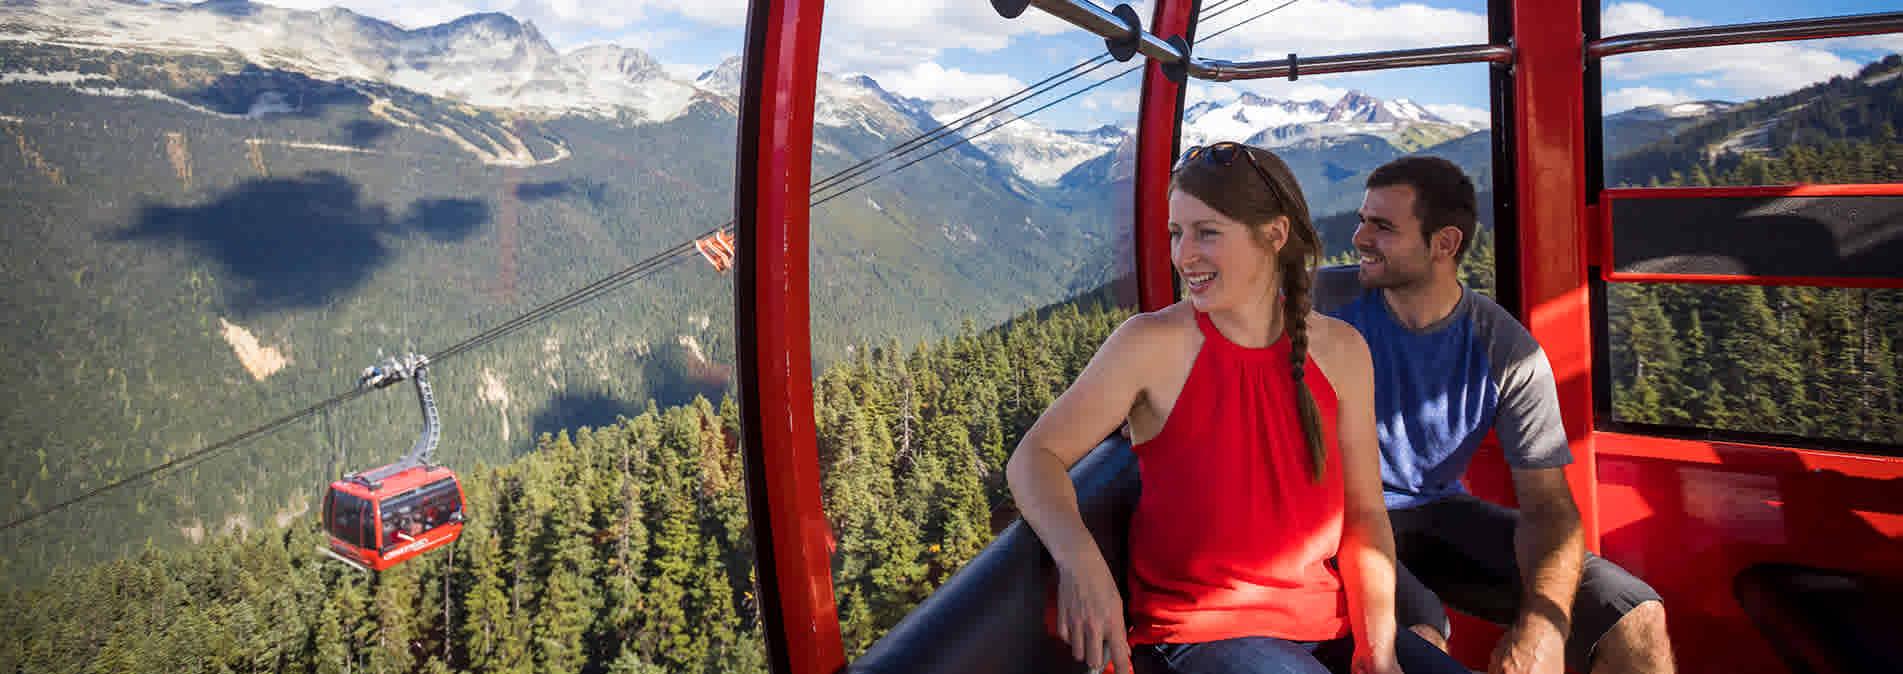 Sightseeing on the PEAK 2 PEAK Gondola in Whistler BC